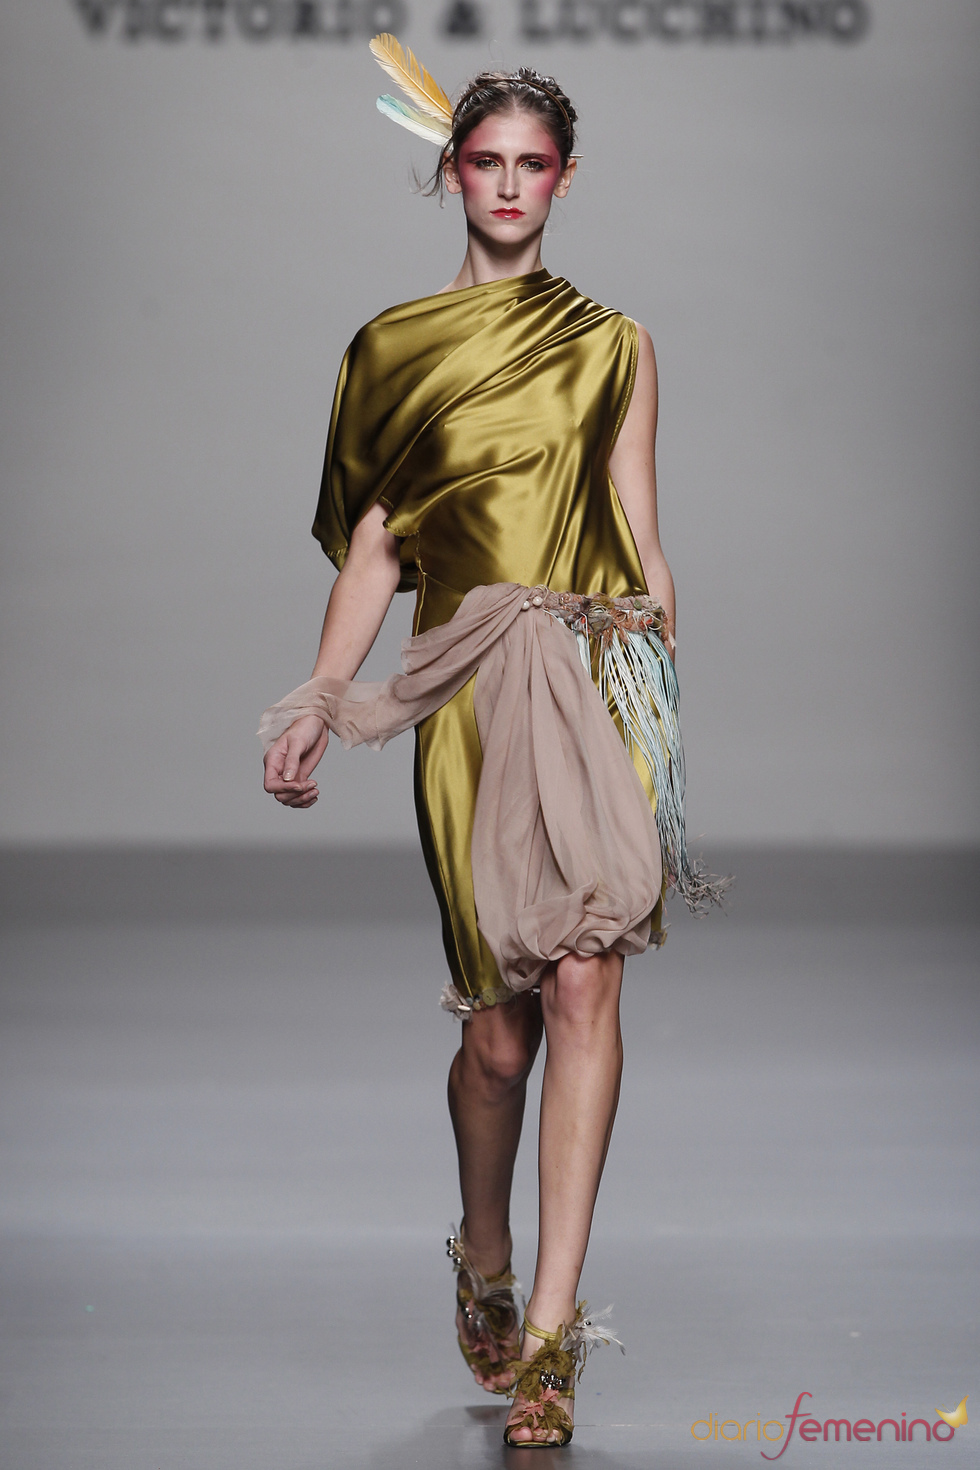 Modelo de Victorio & Lucchino para la primavera-verano 2011